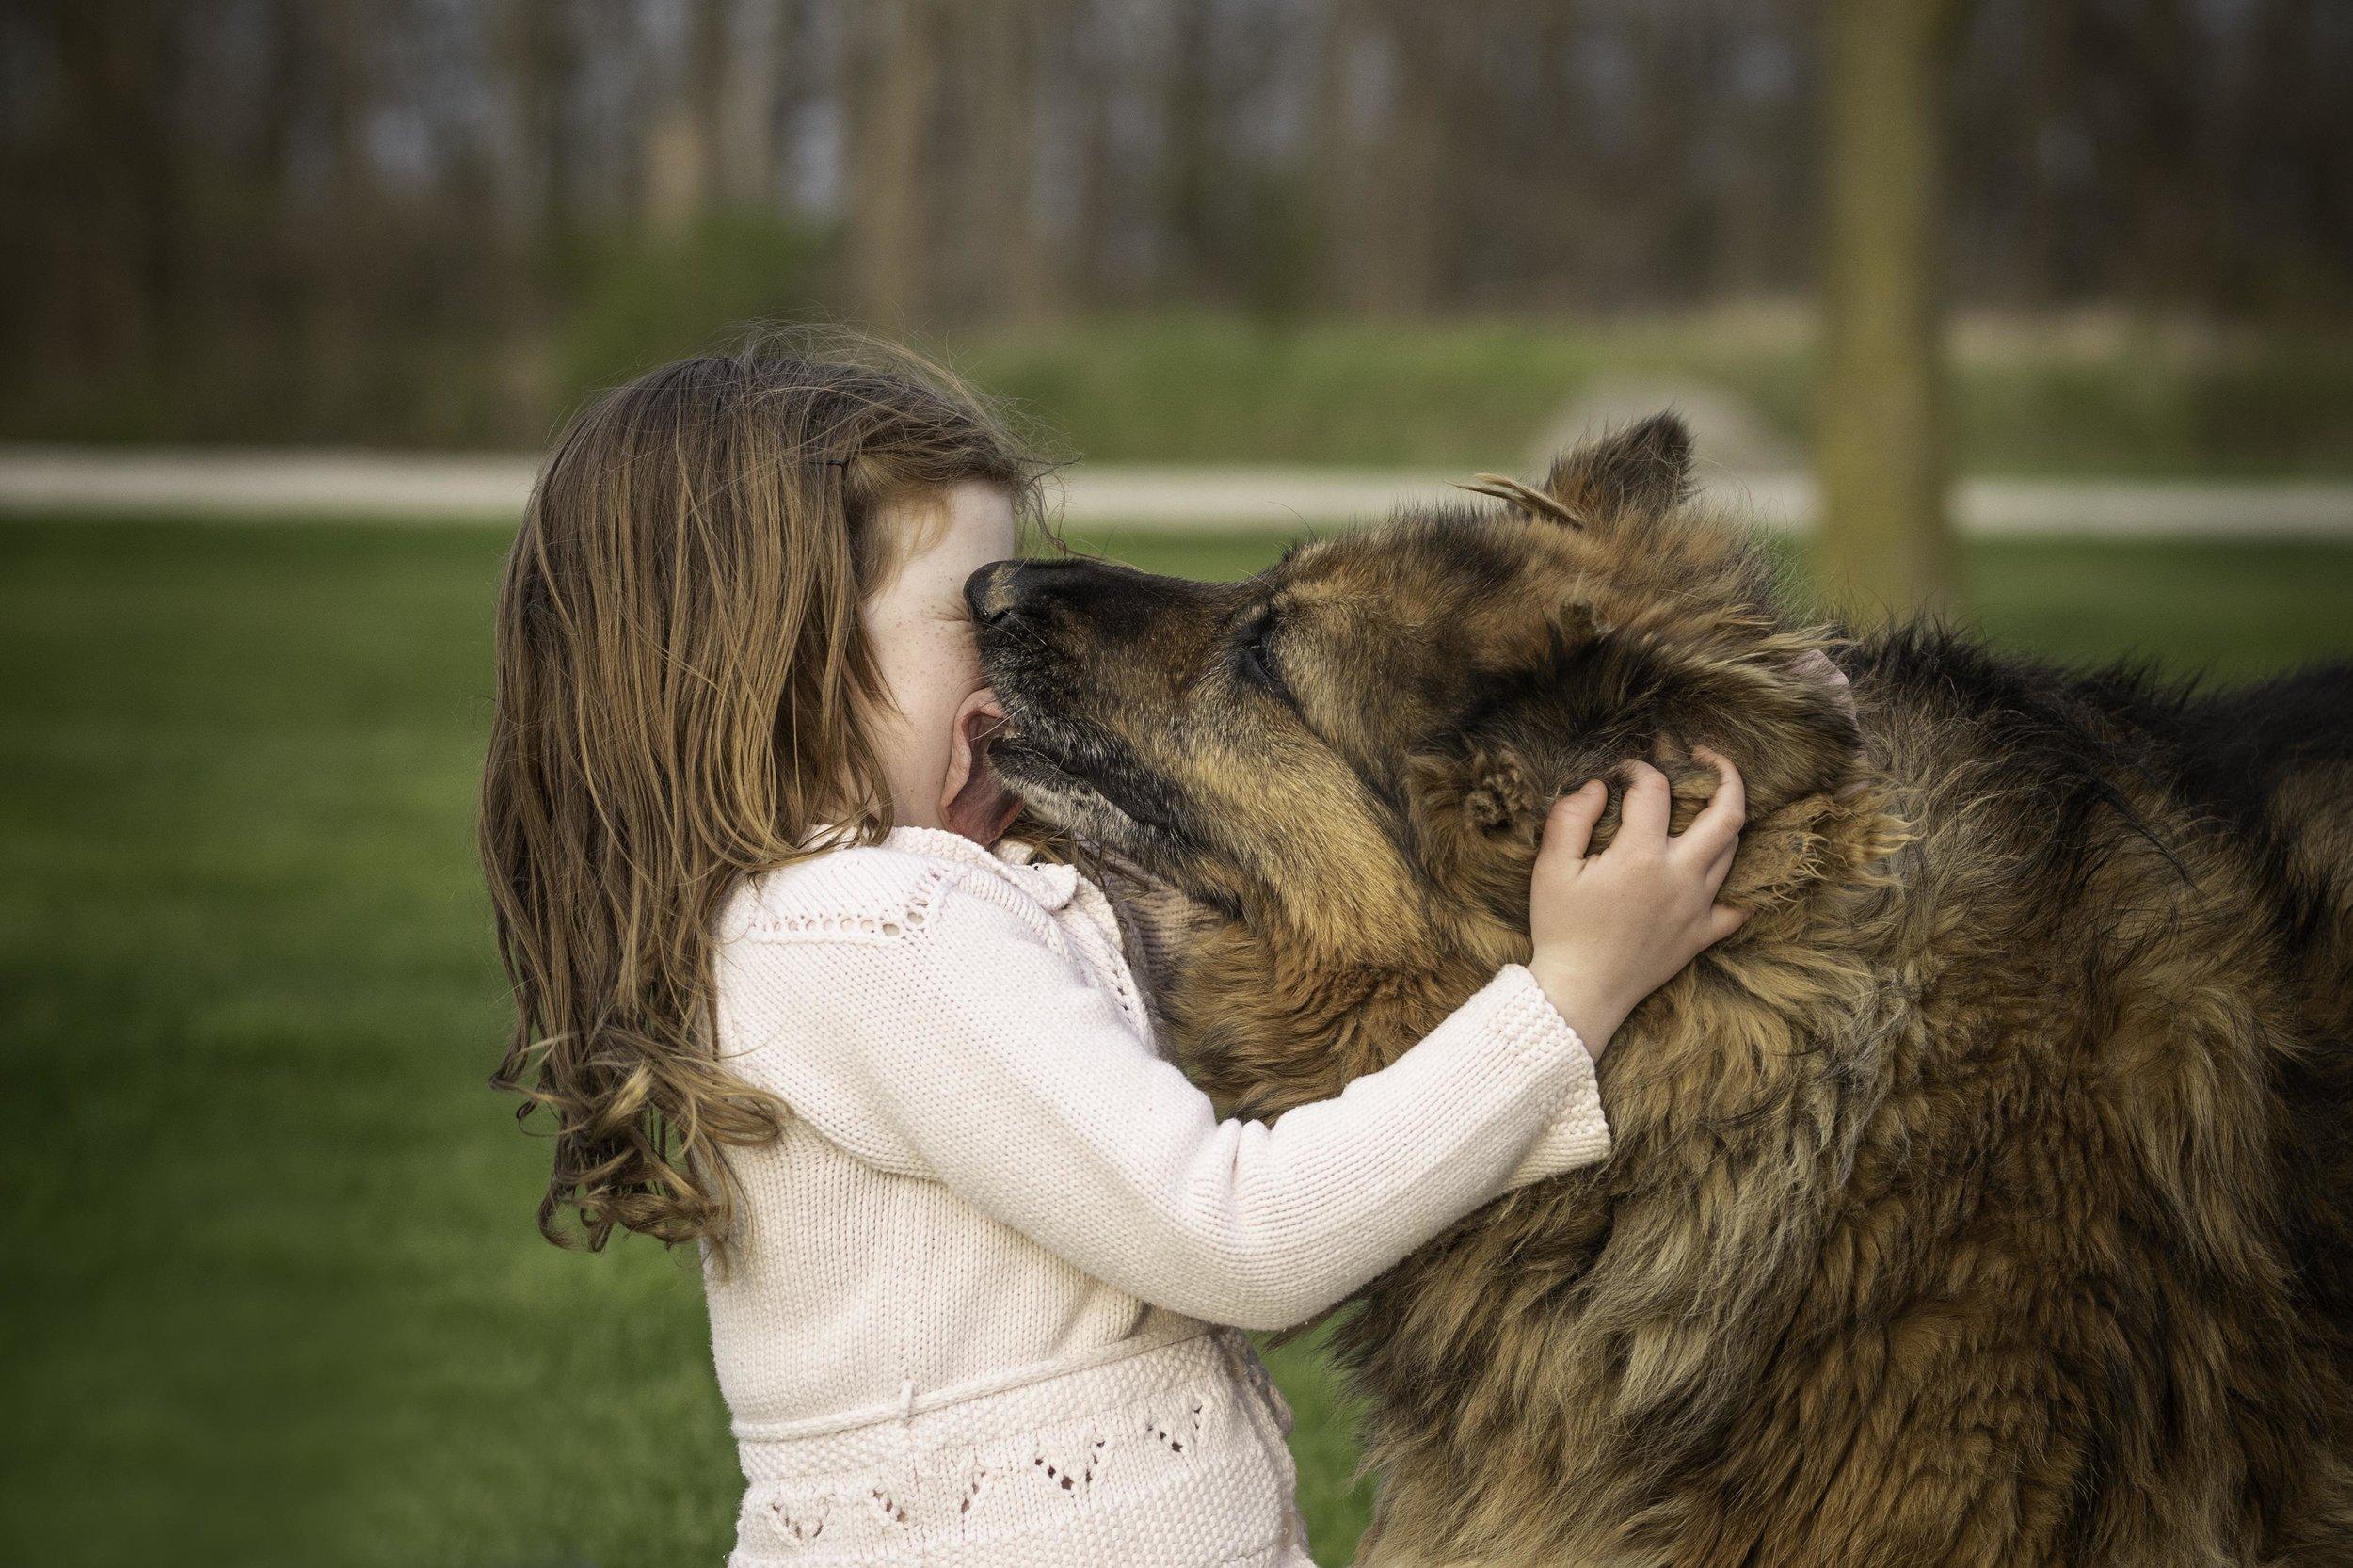 Family-Jodie-Aldred-Photography-Middlesex-london-Dutton-glencoe-ontario-chatham-huron-lambton-elgin-dog-girl.jpg